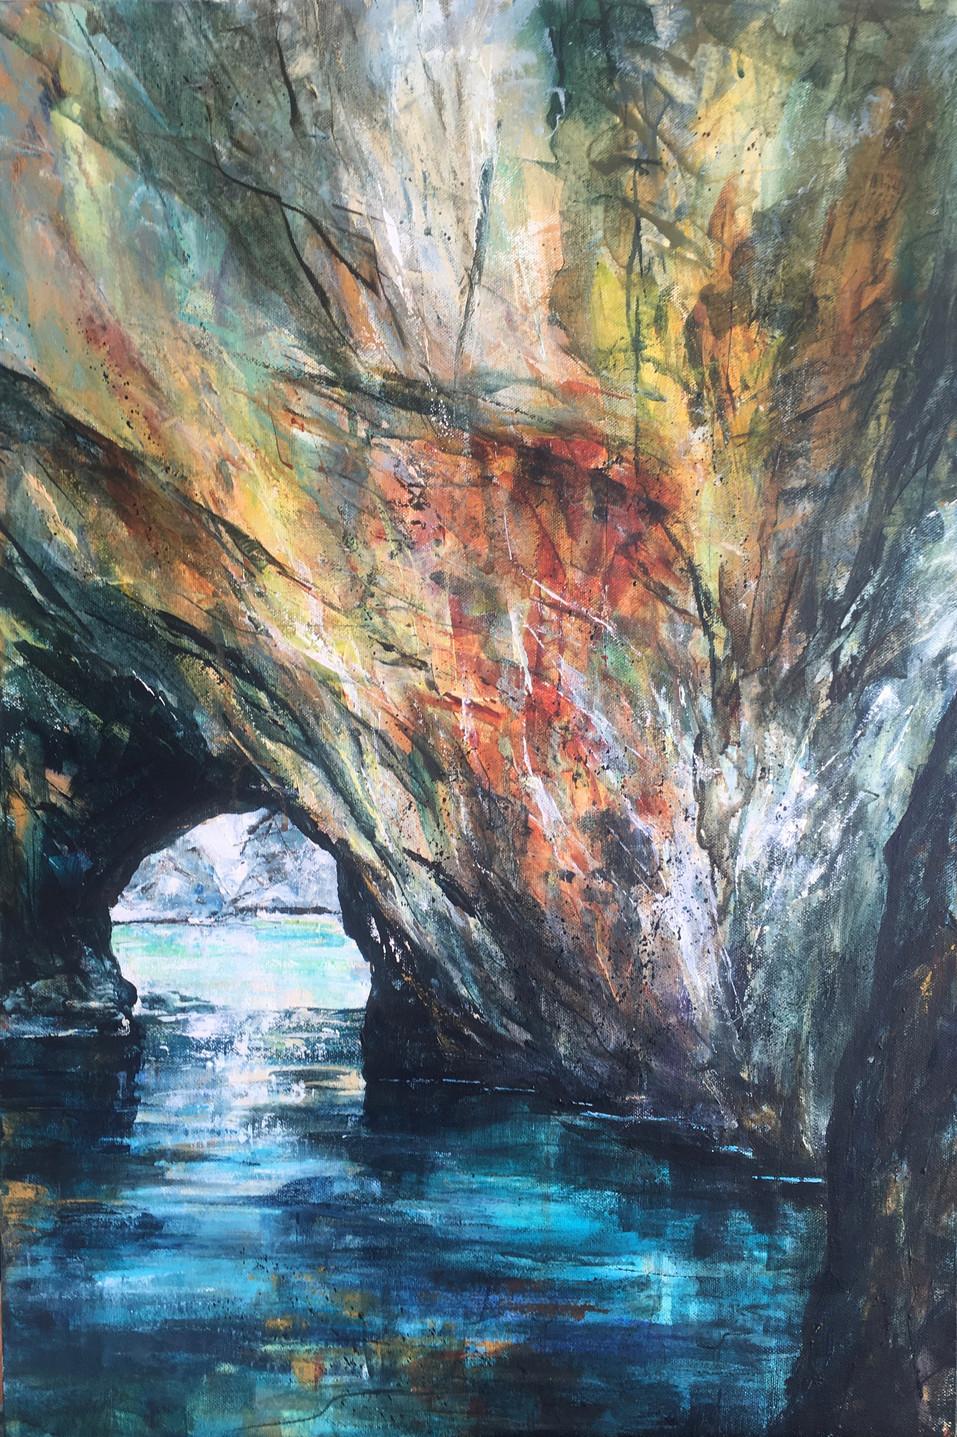 Canoeing Through Secret Caves